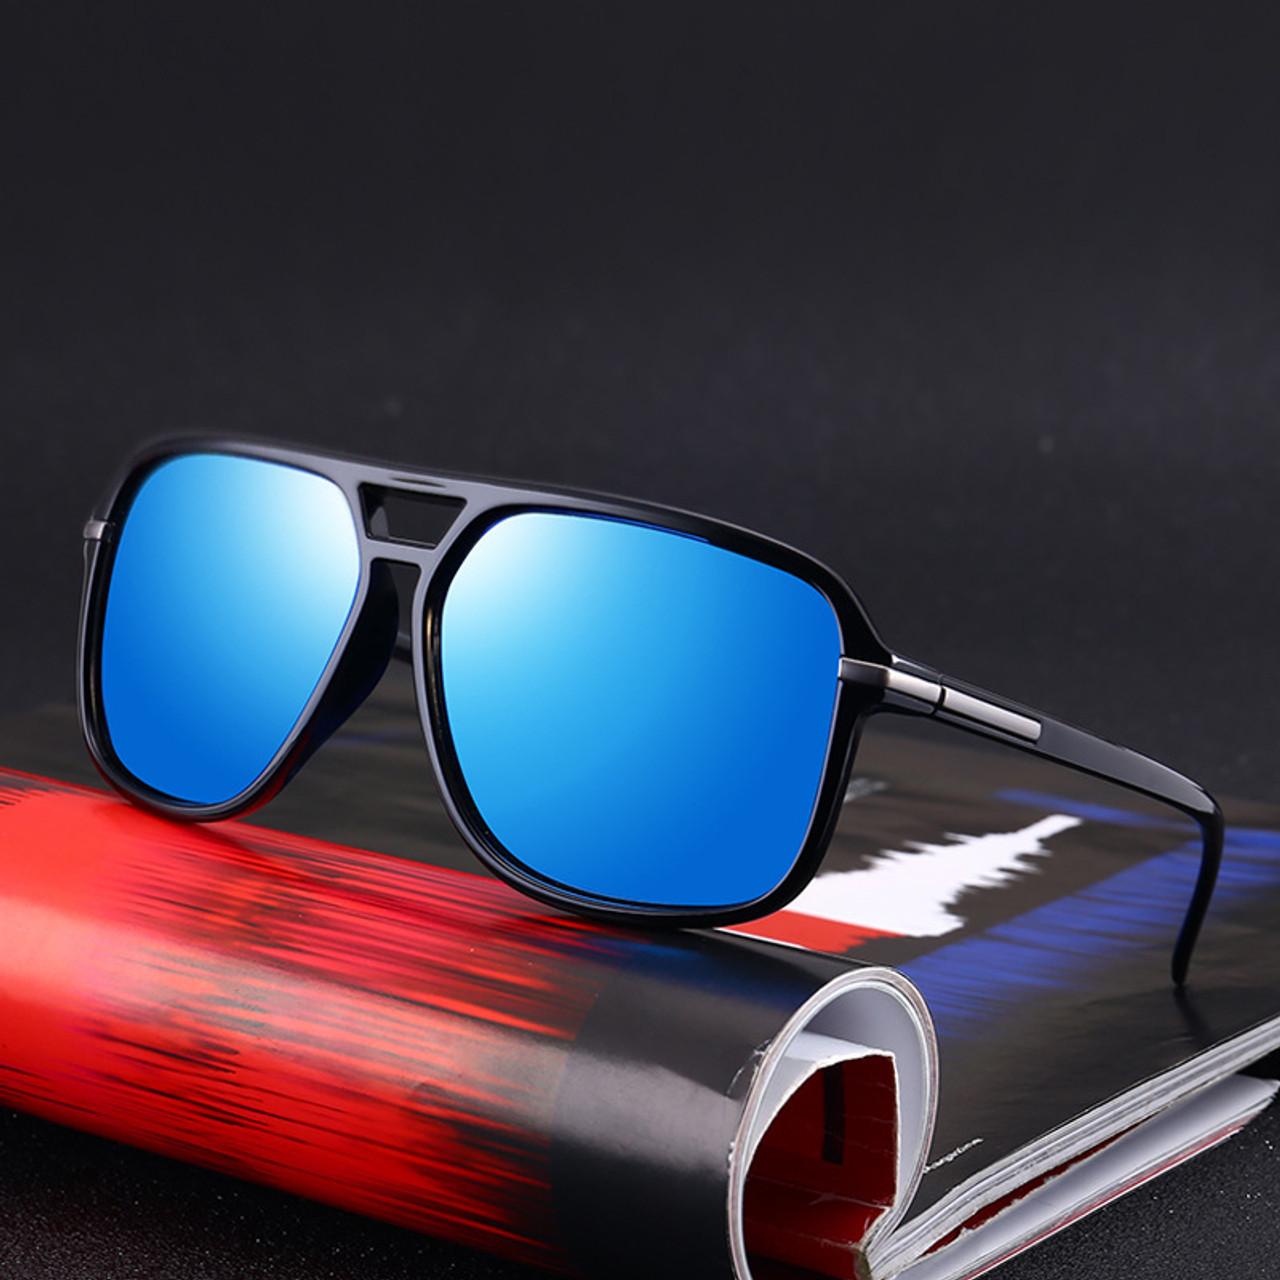 2491b378956 ... UVLAIK Oversized Sunglasses Men Polarized Mirror Goggles Driving Sun  Glasses Man Brand Designer Retro HD Driver ...